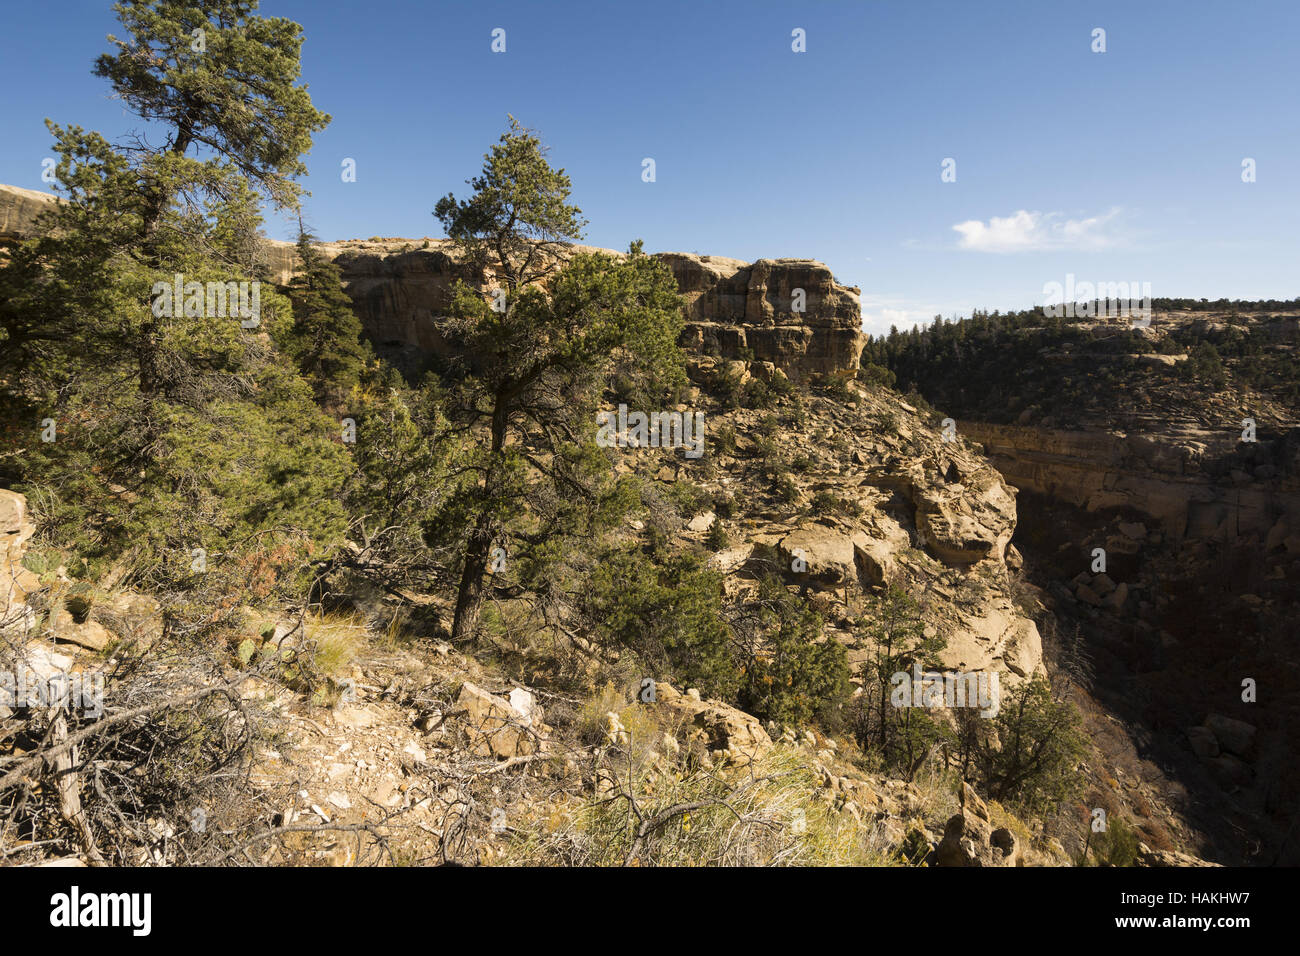 Colorado, Ute Mountain Tribal Park, landscape - Stock Image